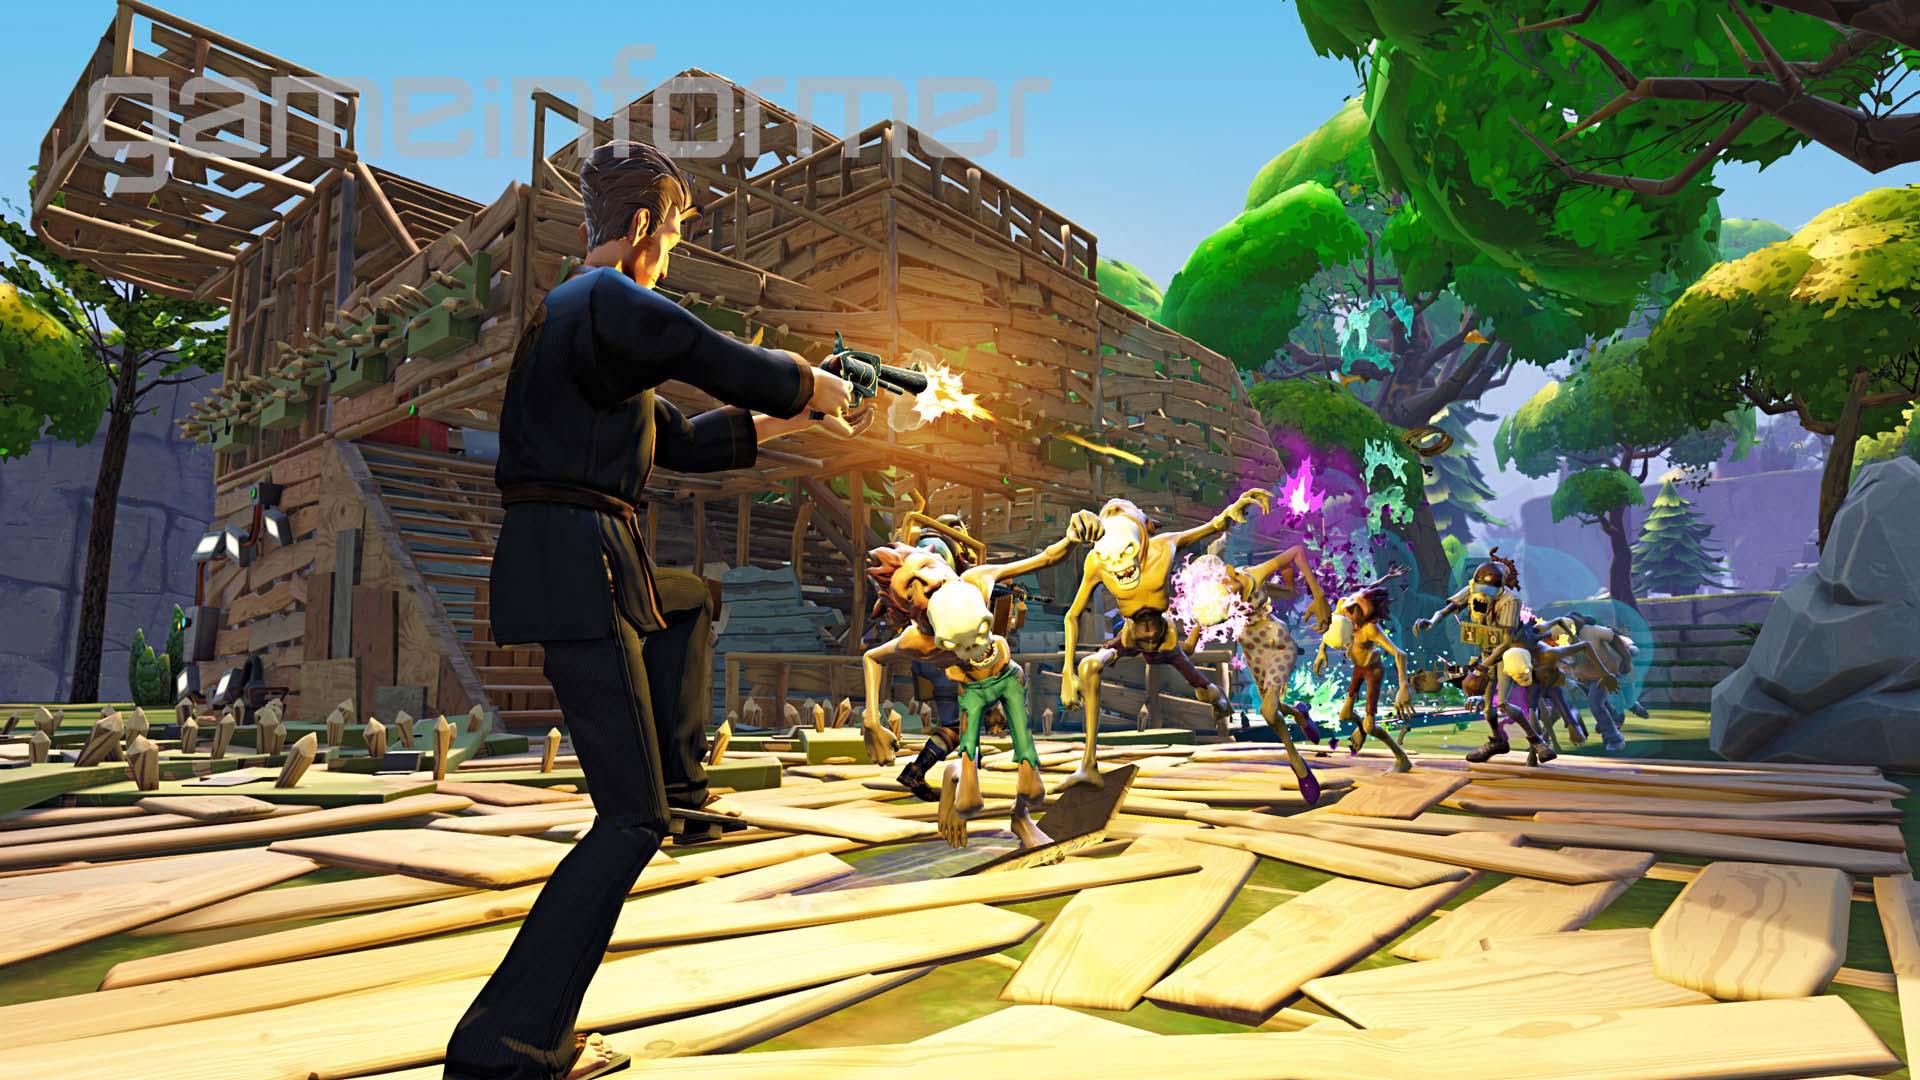 Fortnite fait la couverture de Game Informer   Xbox One ...